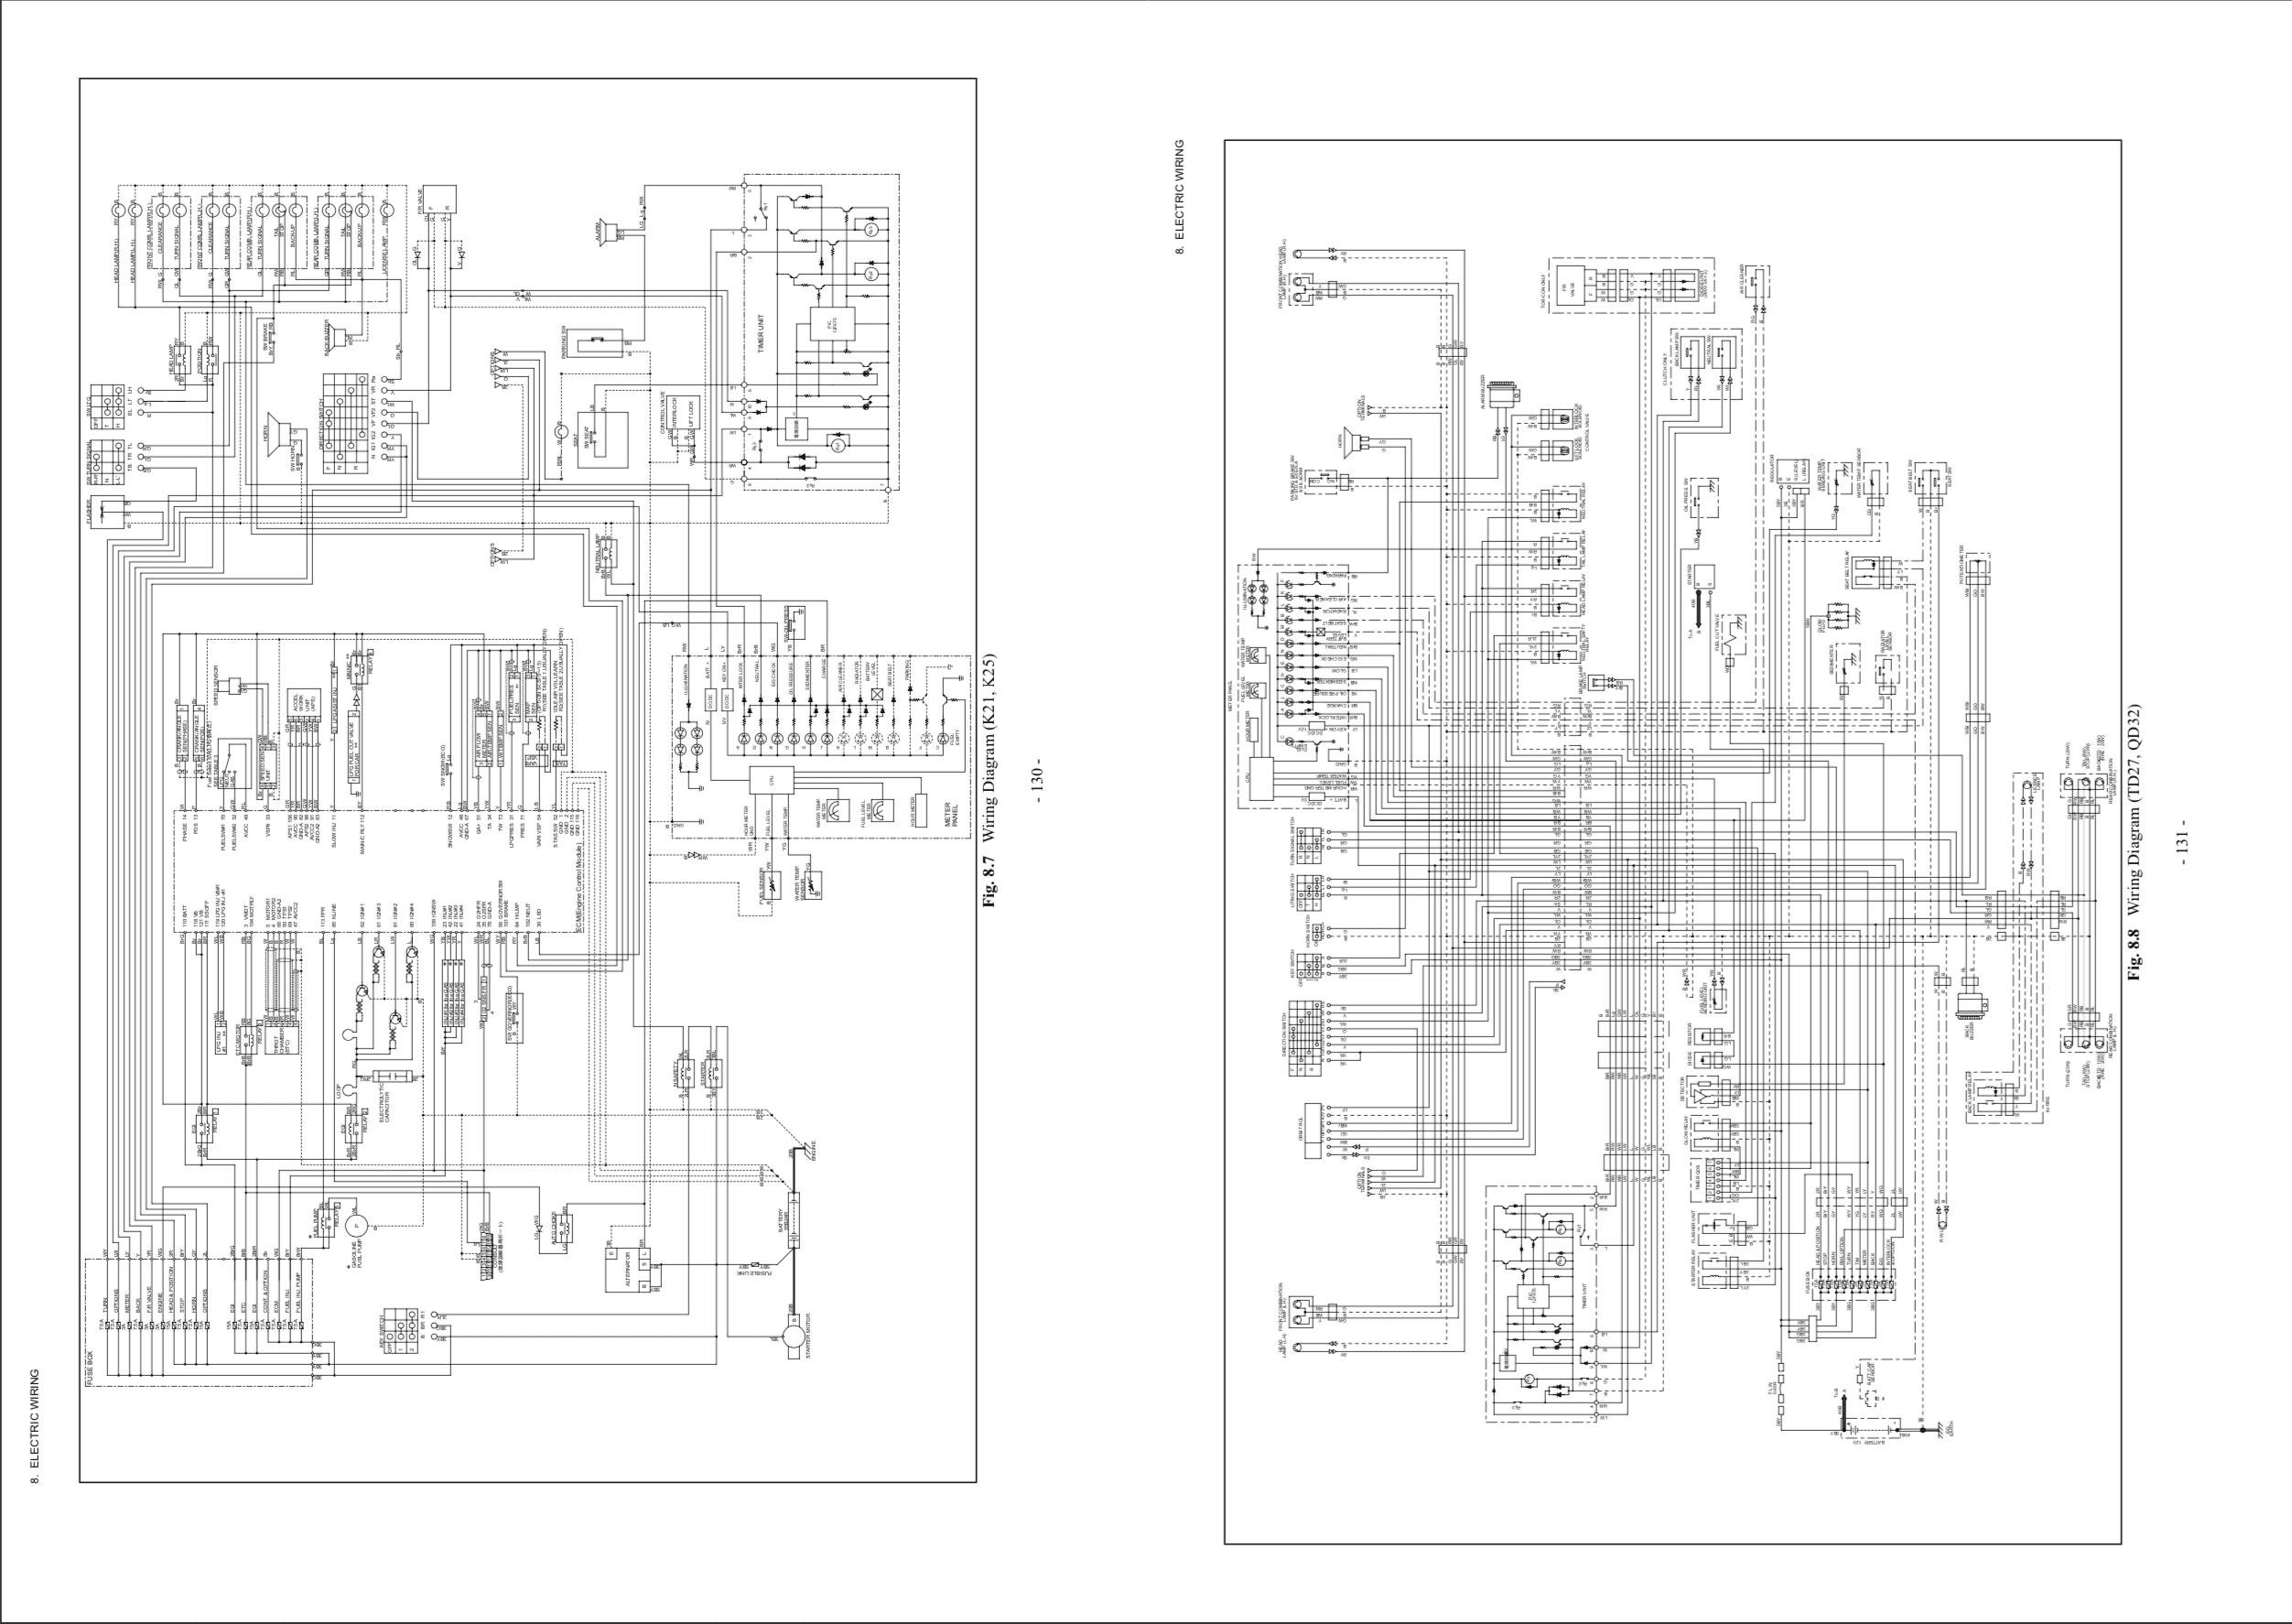 Tcm Forklift Wiring Diagram - Fusebox and Wiring Diagram series-hut -  series-hut.sirtarghe.itdiagram database